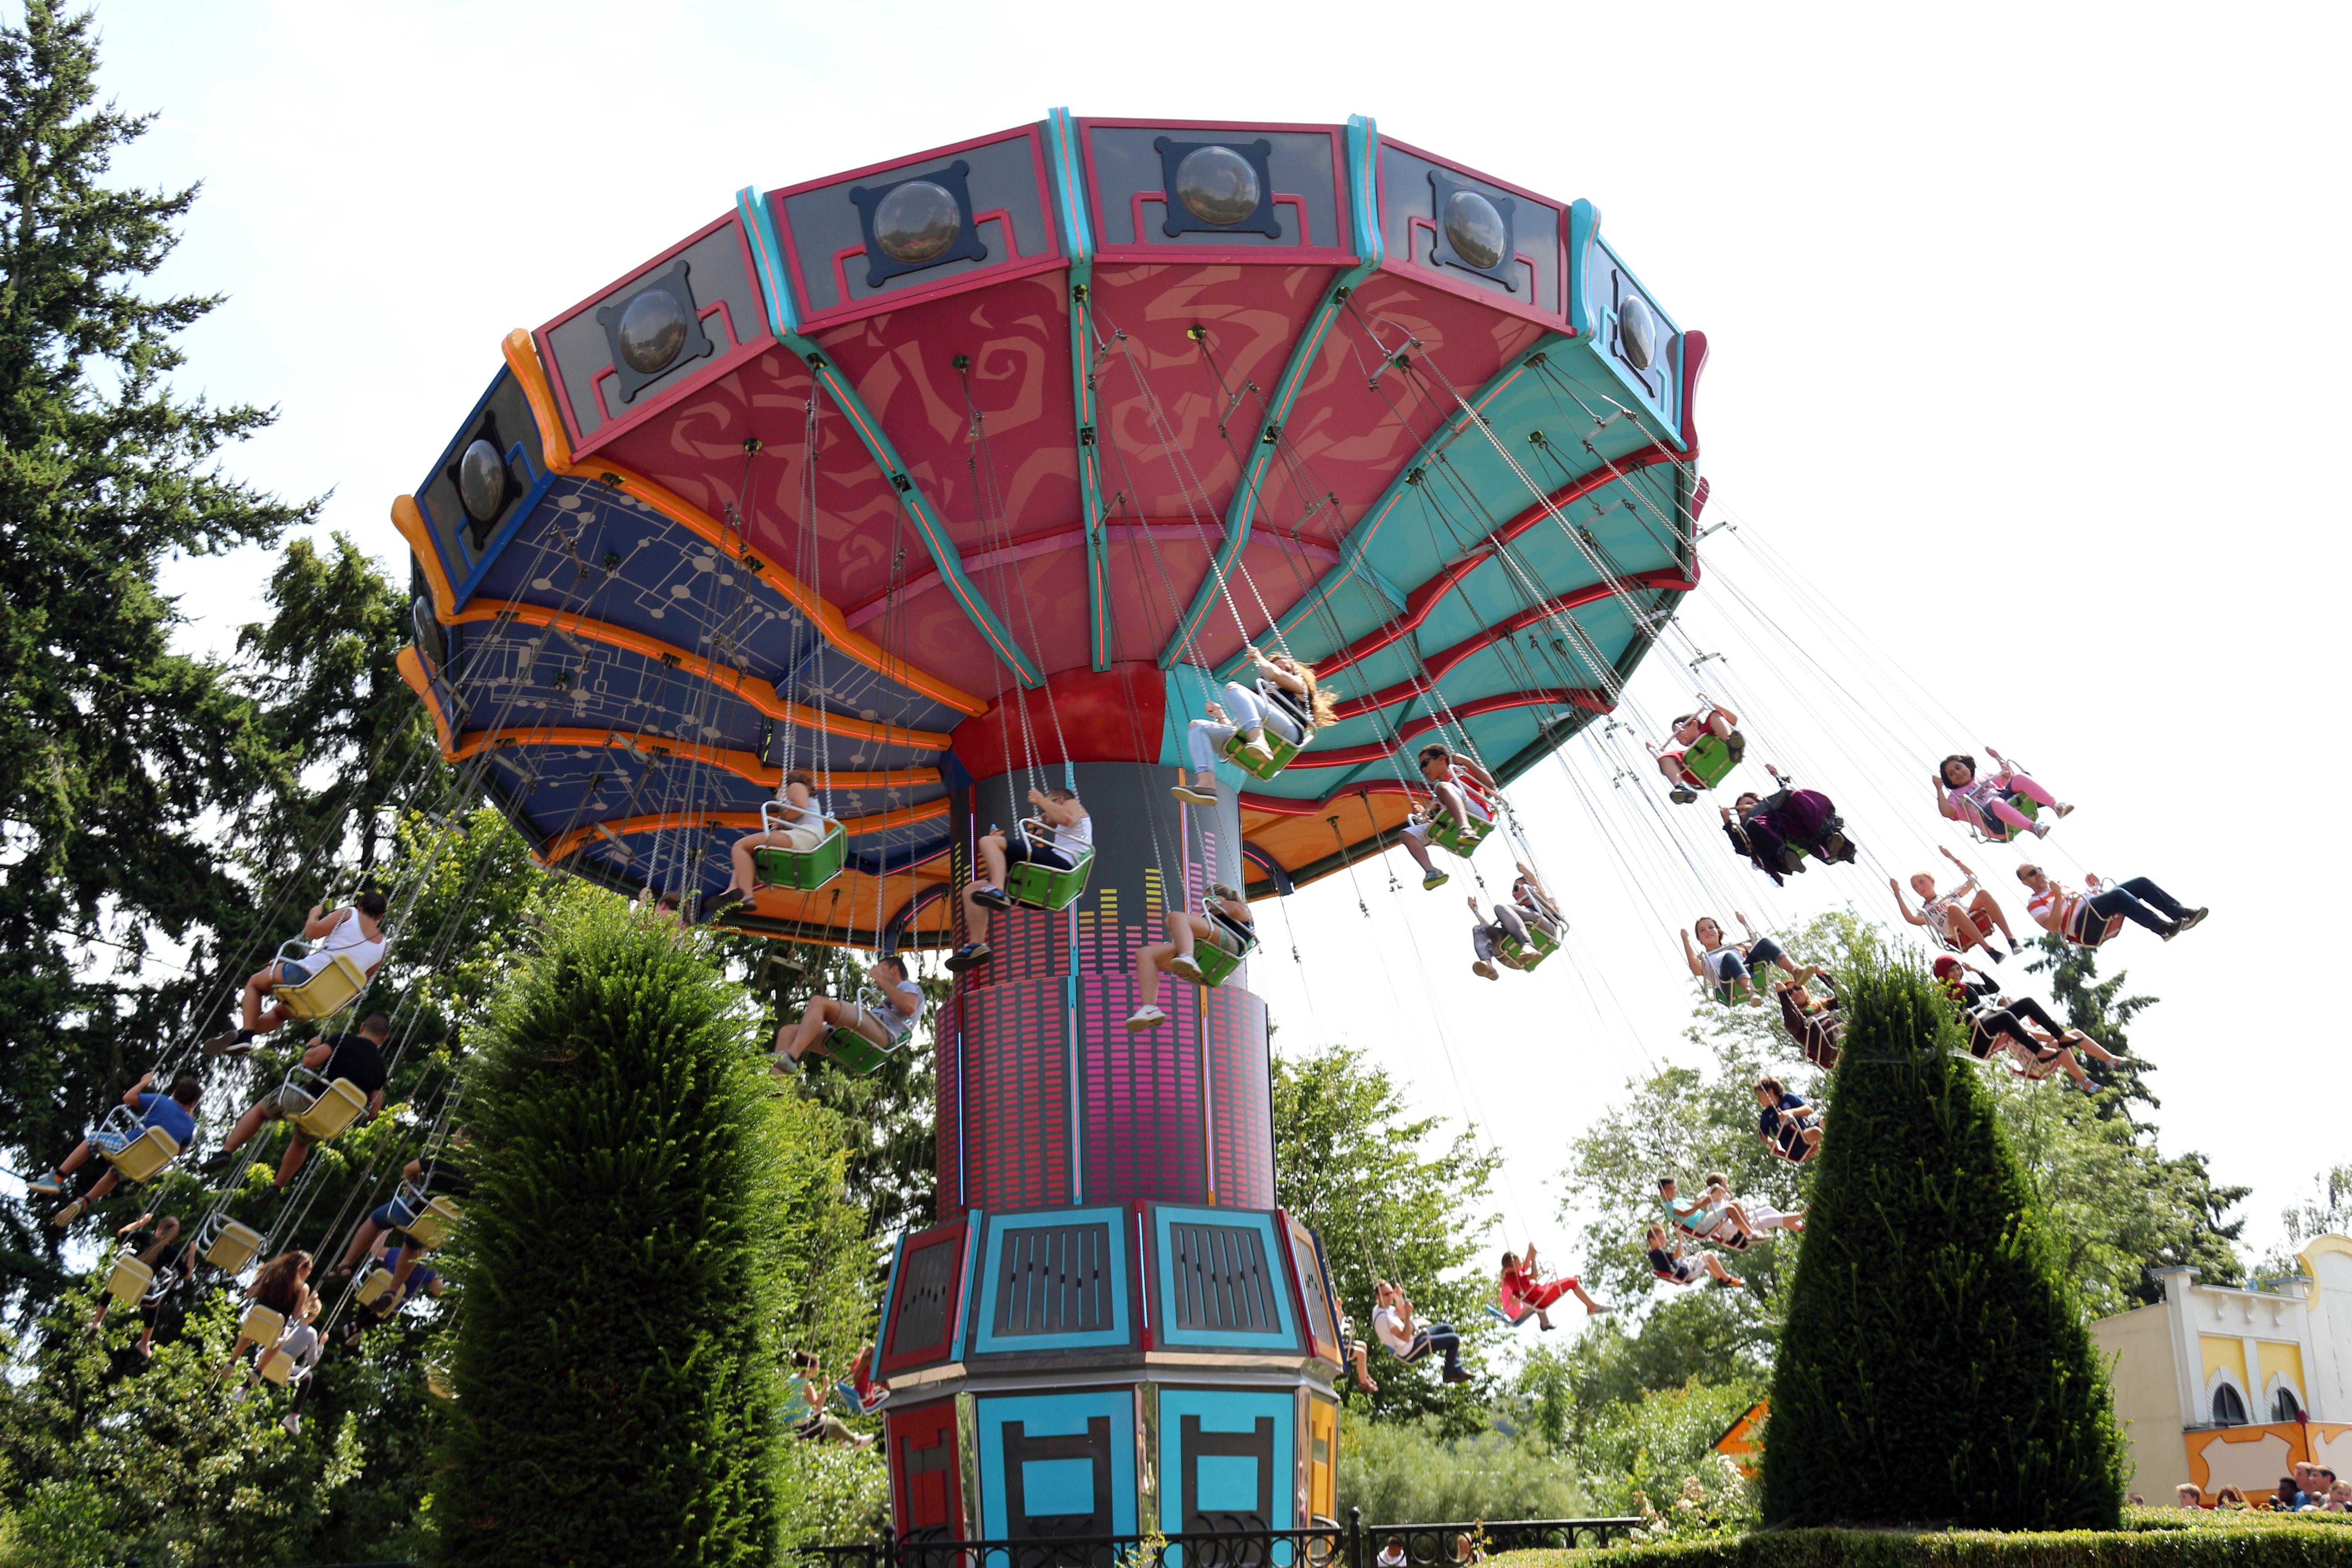 Bouwer In De Kijker Zierer Themeparkfreaks